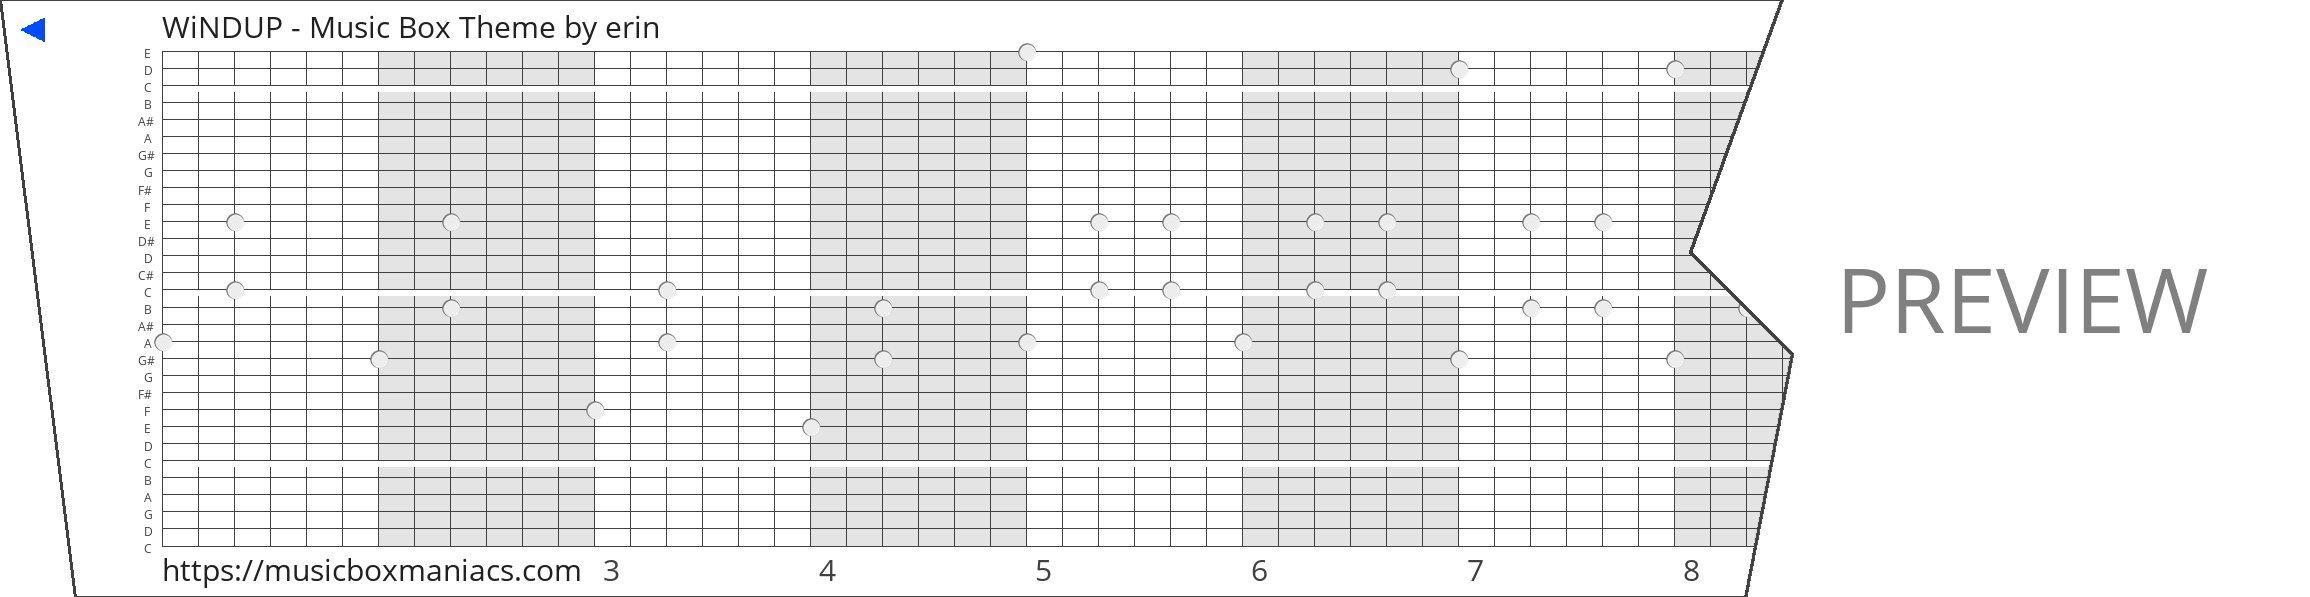 WiNDUP - Music Box Theme 30 note music box paper strip